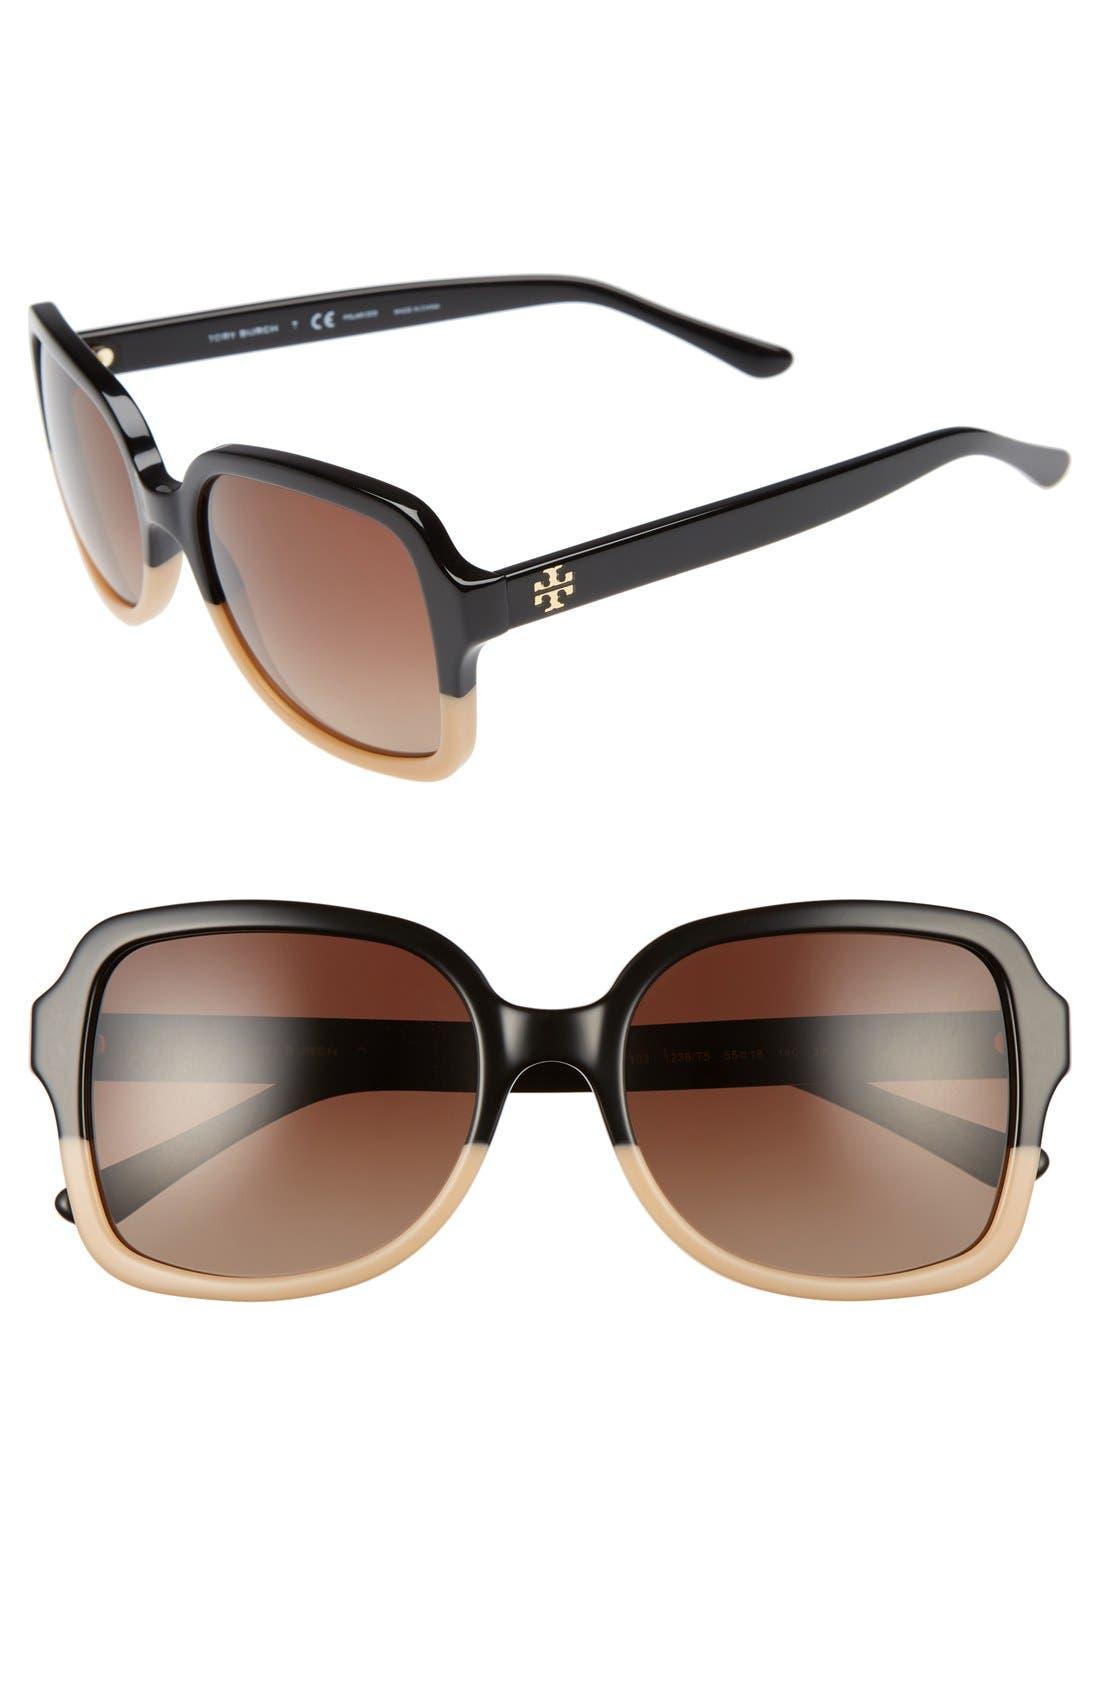 55mm Polarized Sunglasses,                             Main thumbnail 1, color,                             001